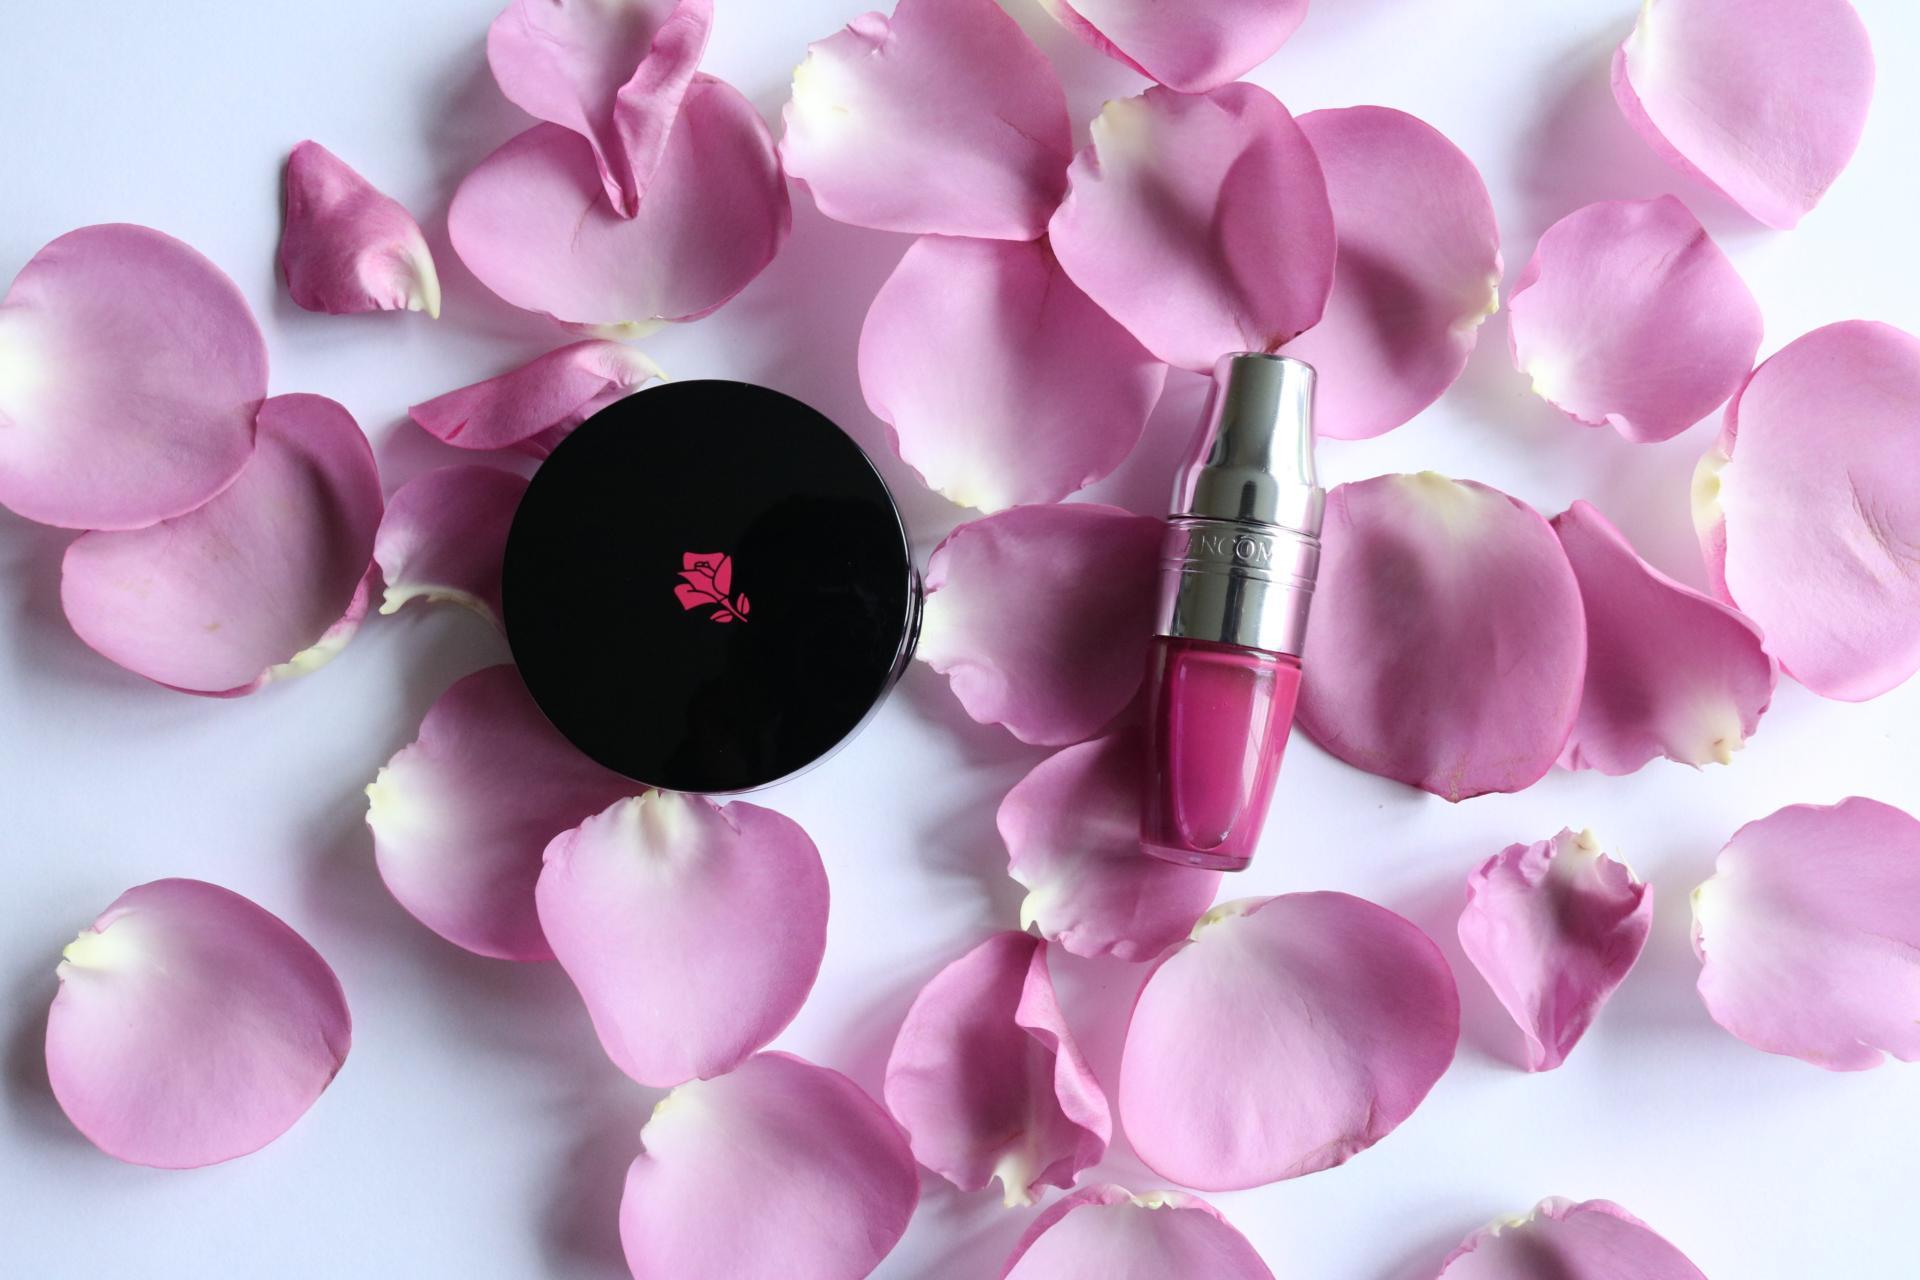 Lancôme Juicy Shakers and Cushion Blush Subtil | www.styledomination.com